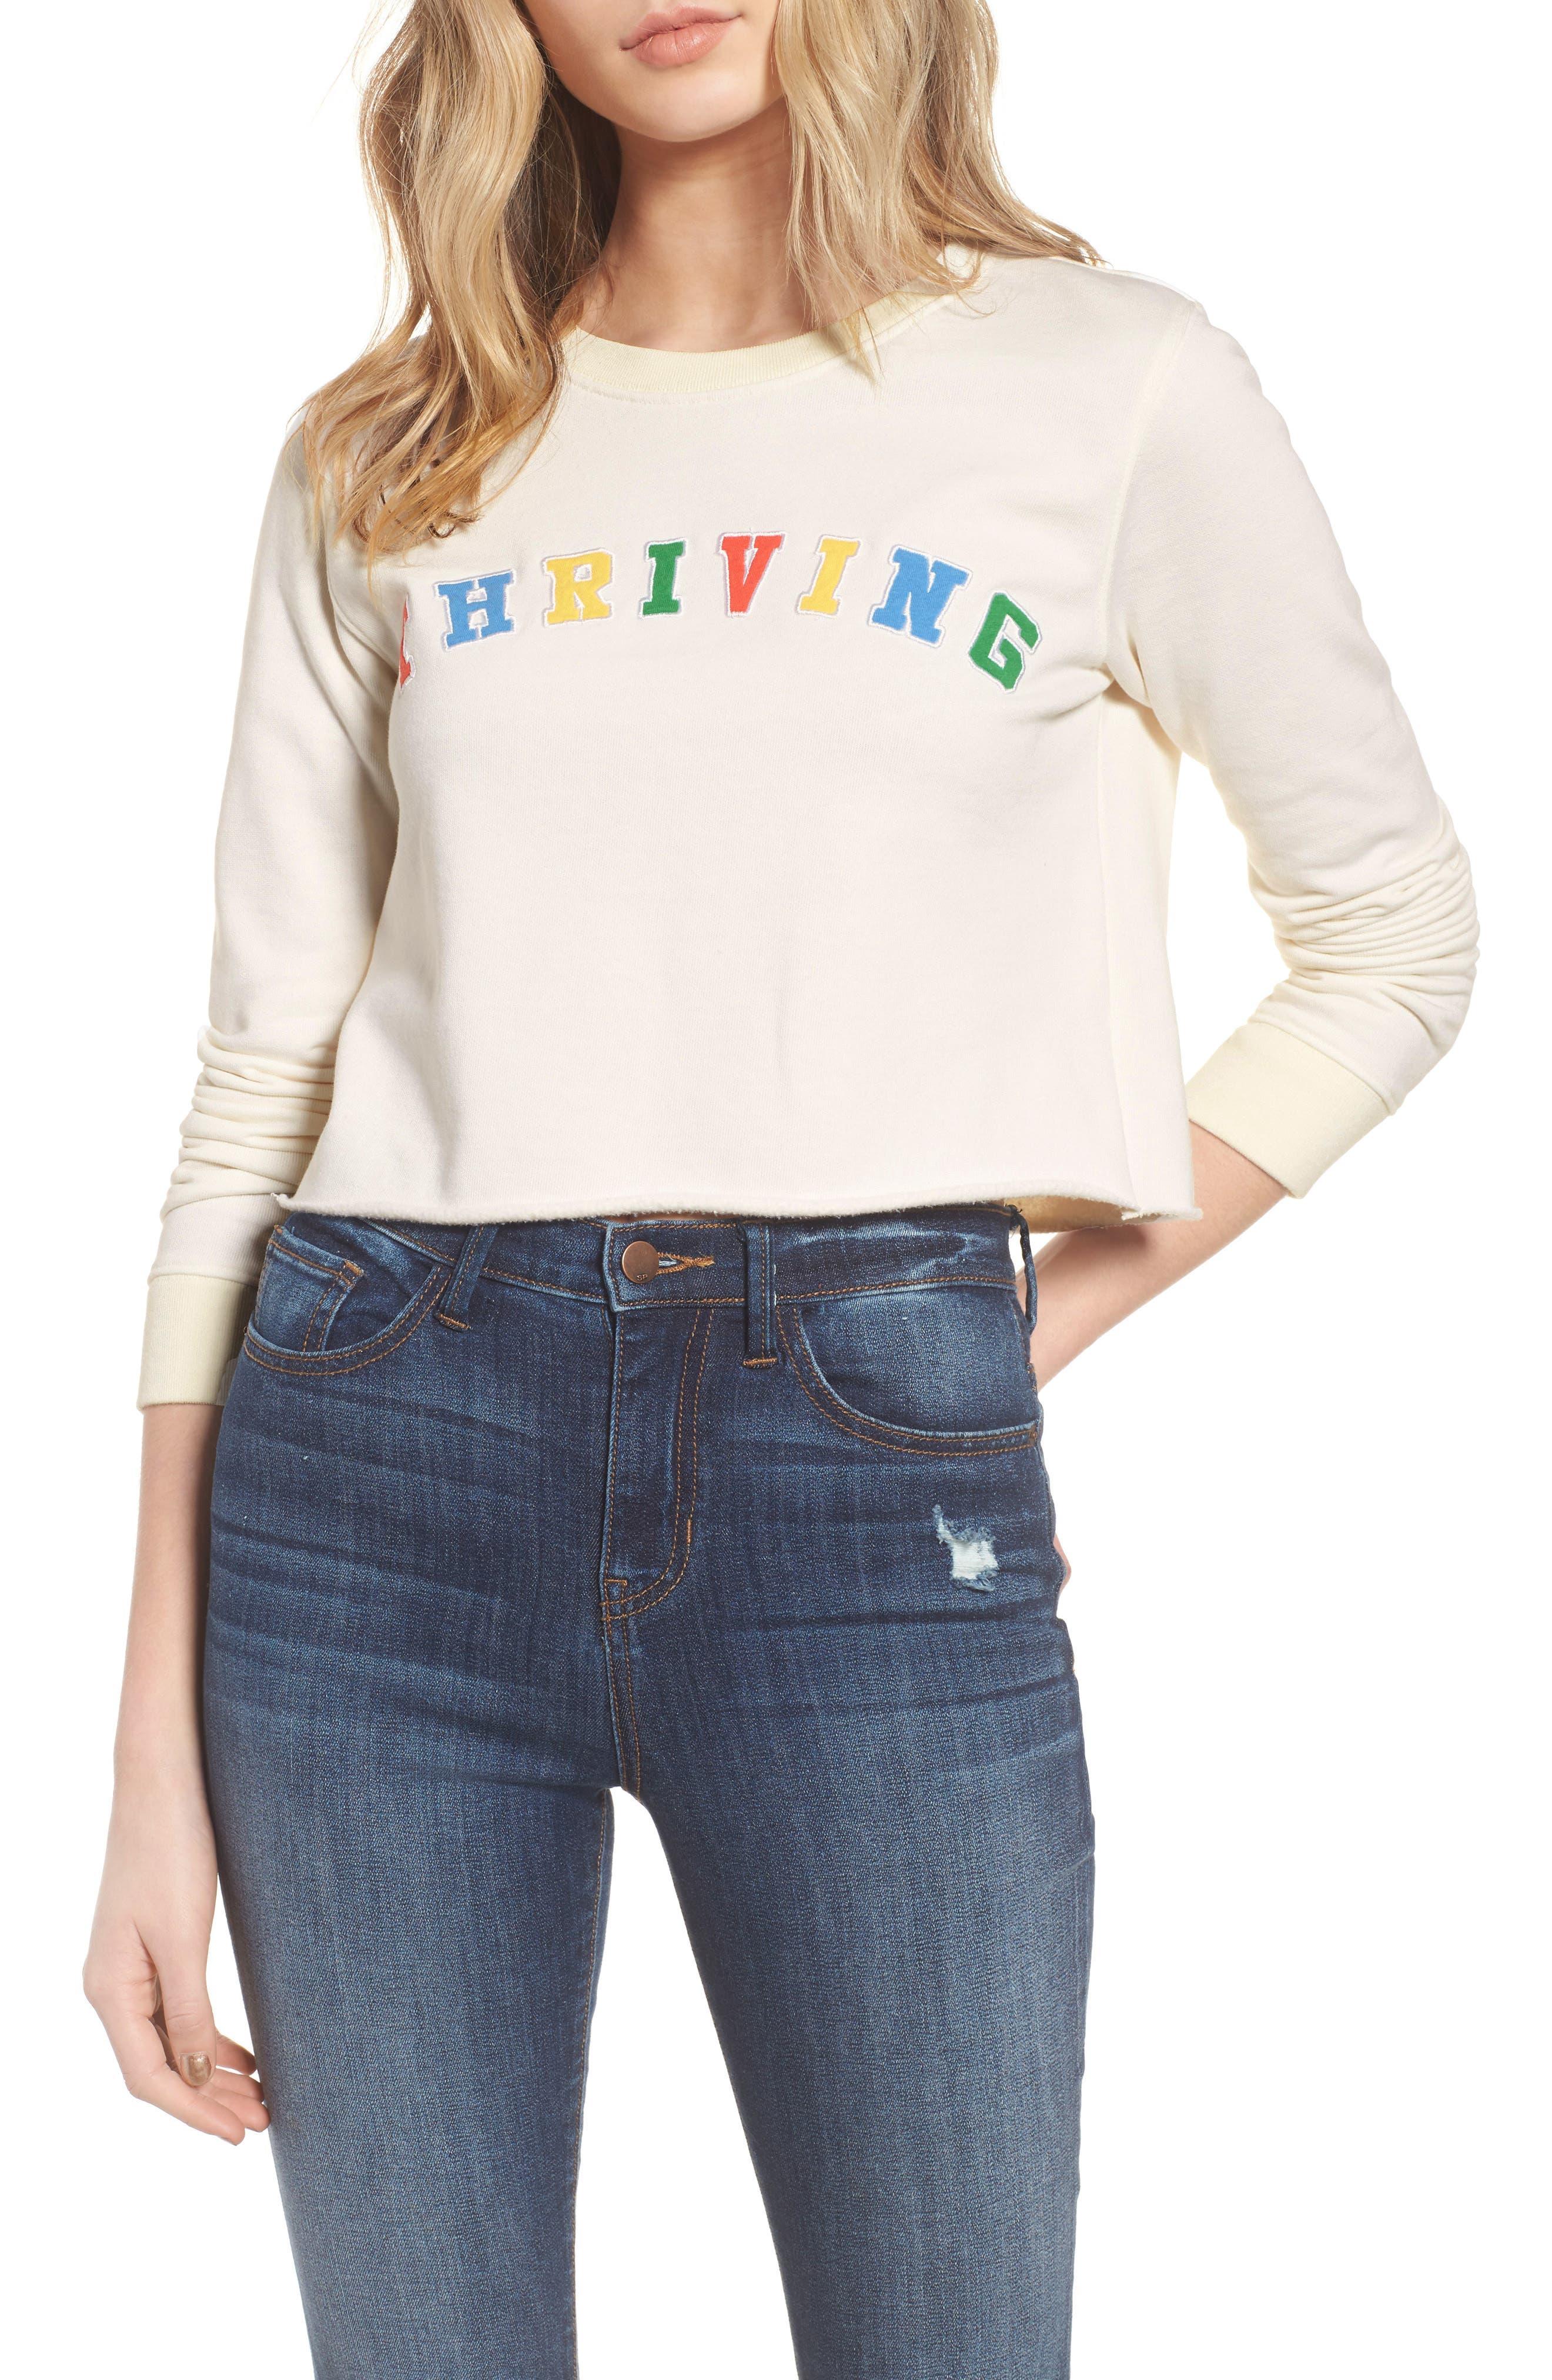 Thriving Crop Sweatshirt,                         Main,                         color, 900